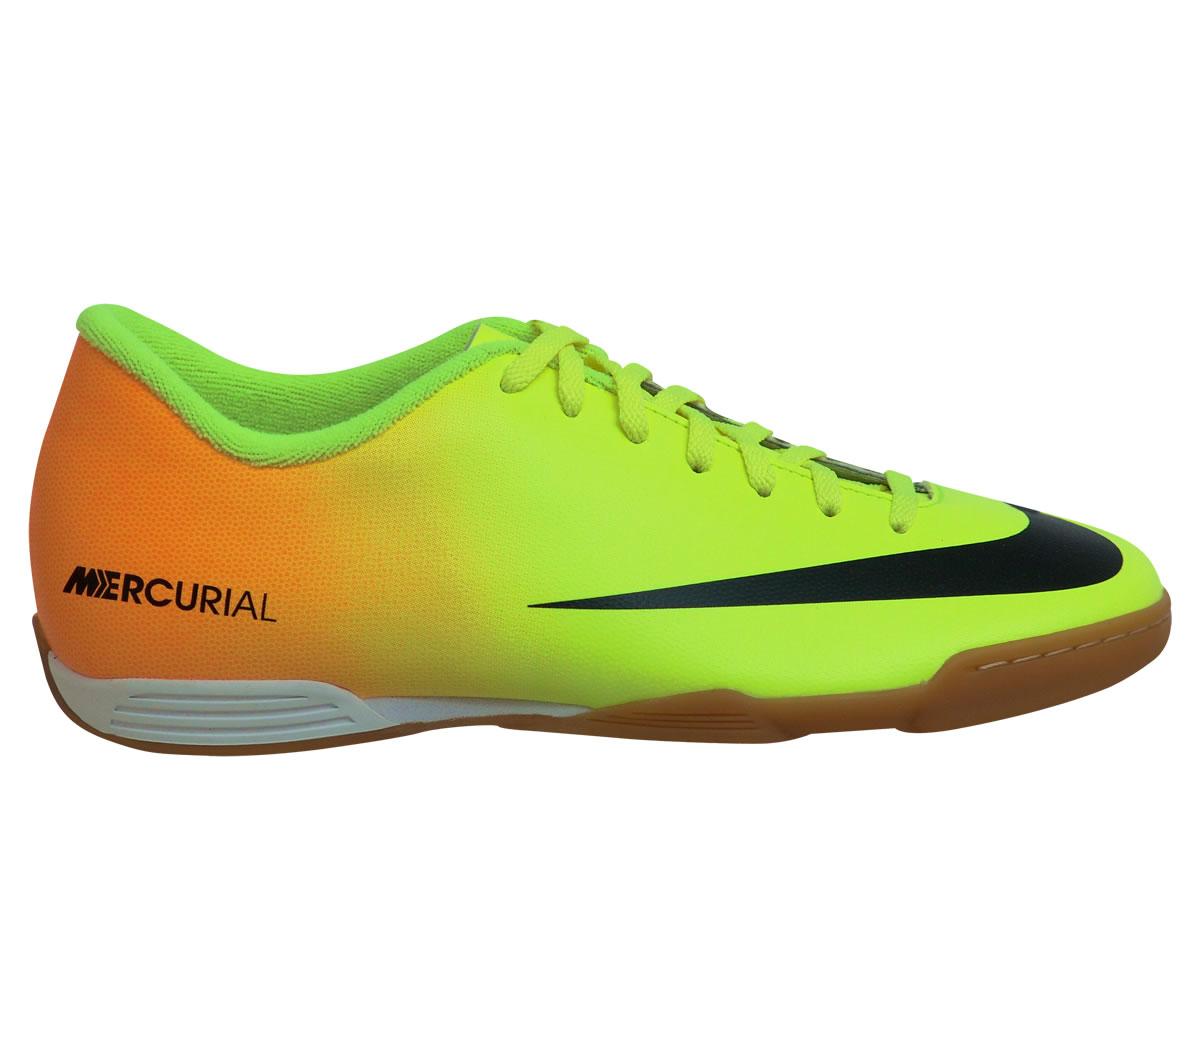 7ffe23e567 Tenis Nike Mercurial Vortex Futsal Amarelo e Laranja - Mundo do Futebol